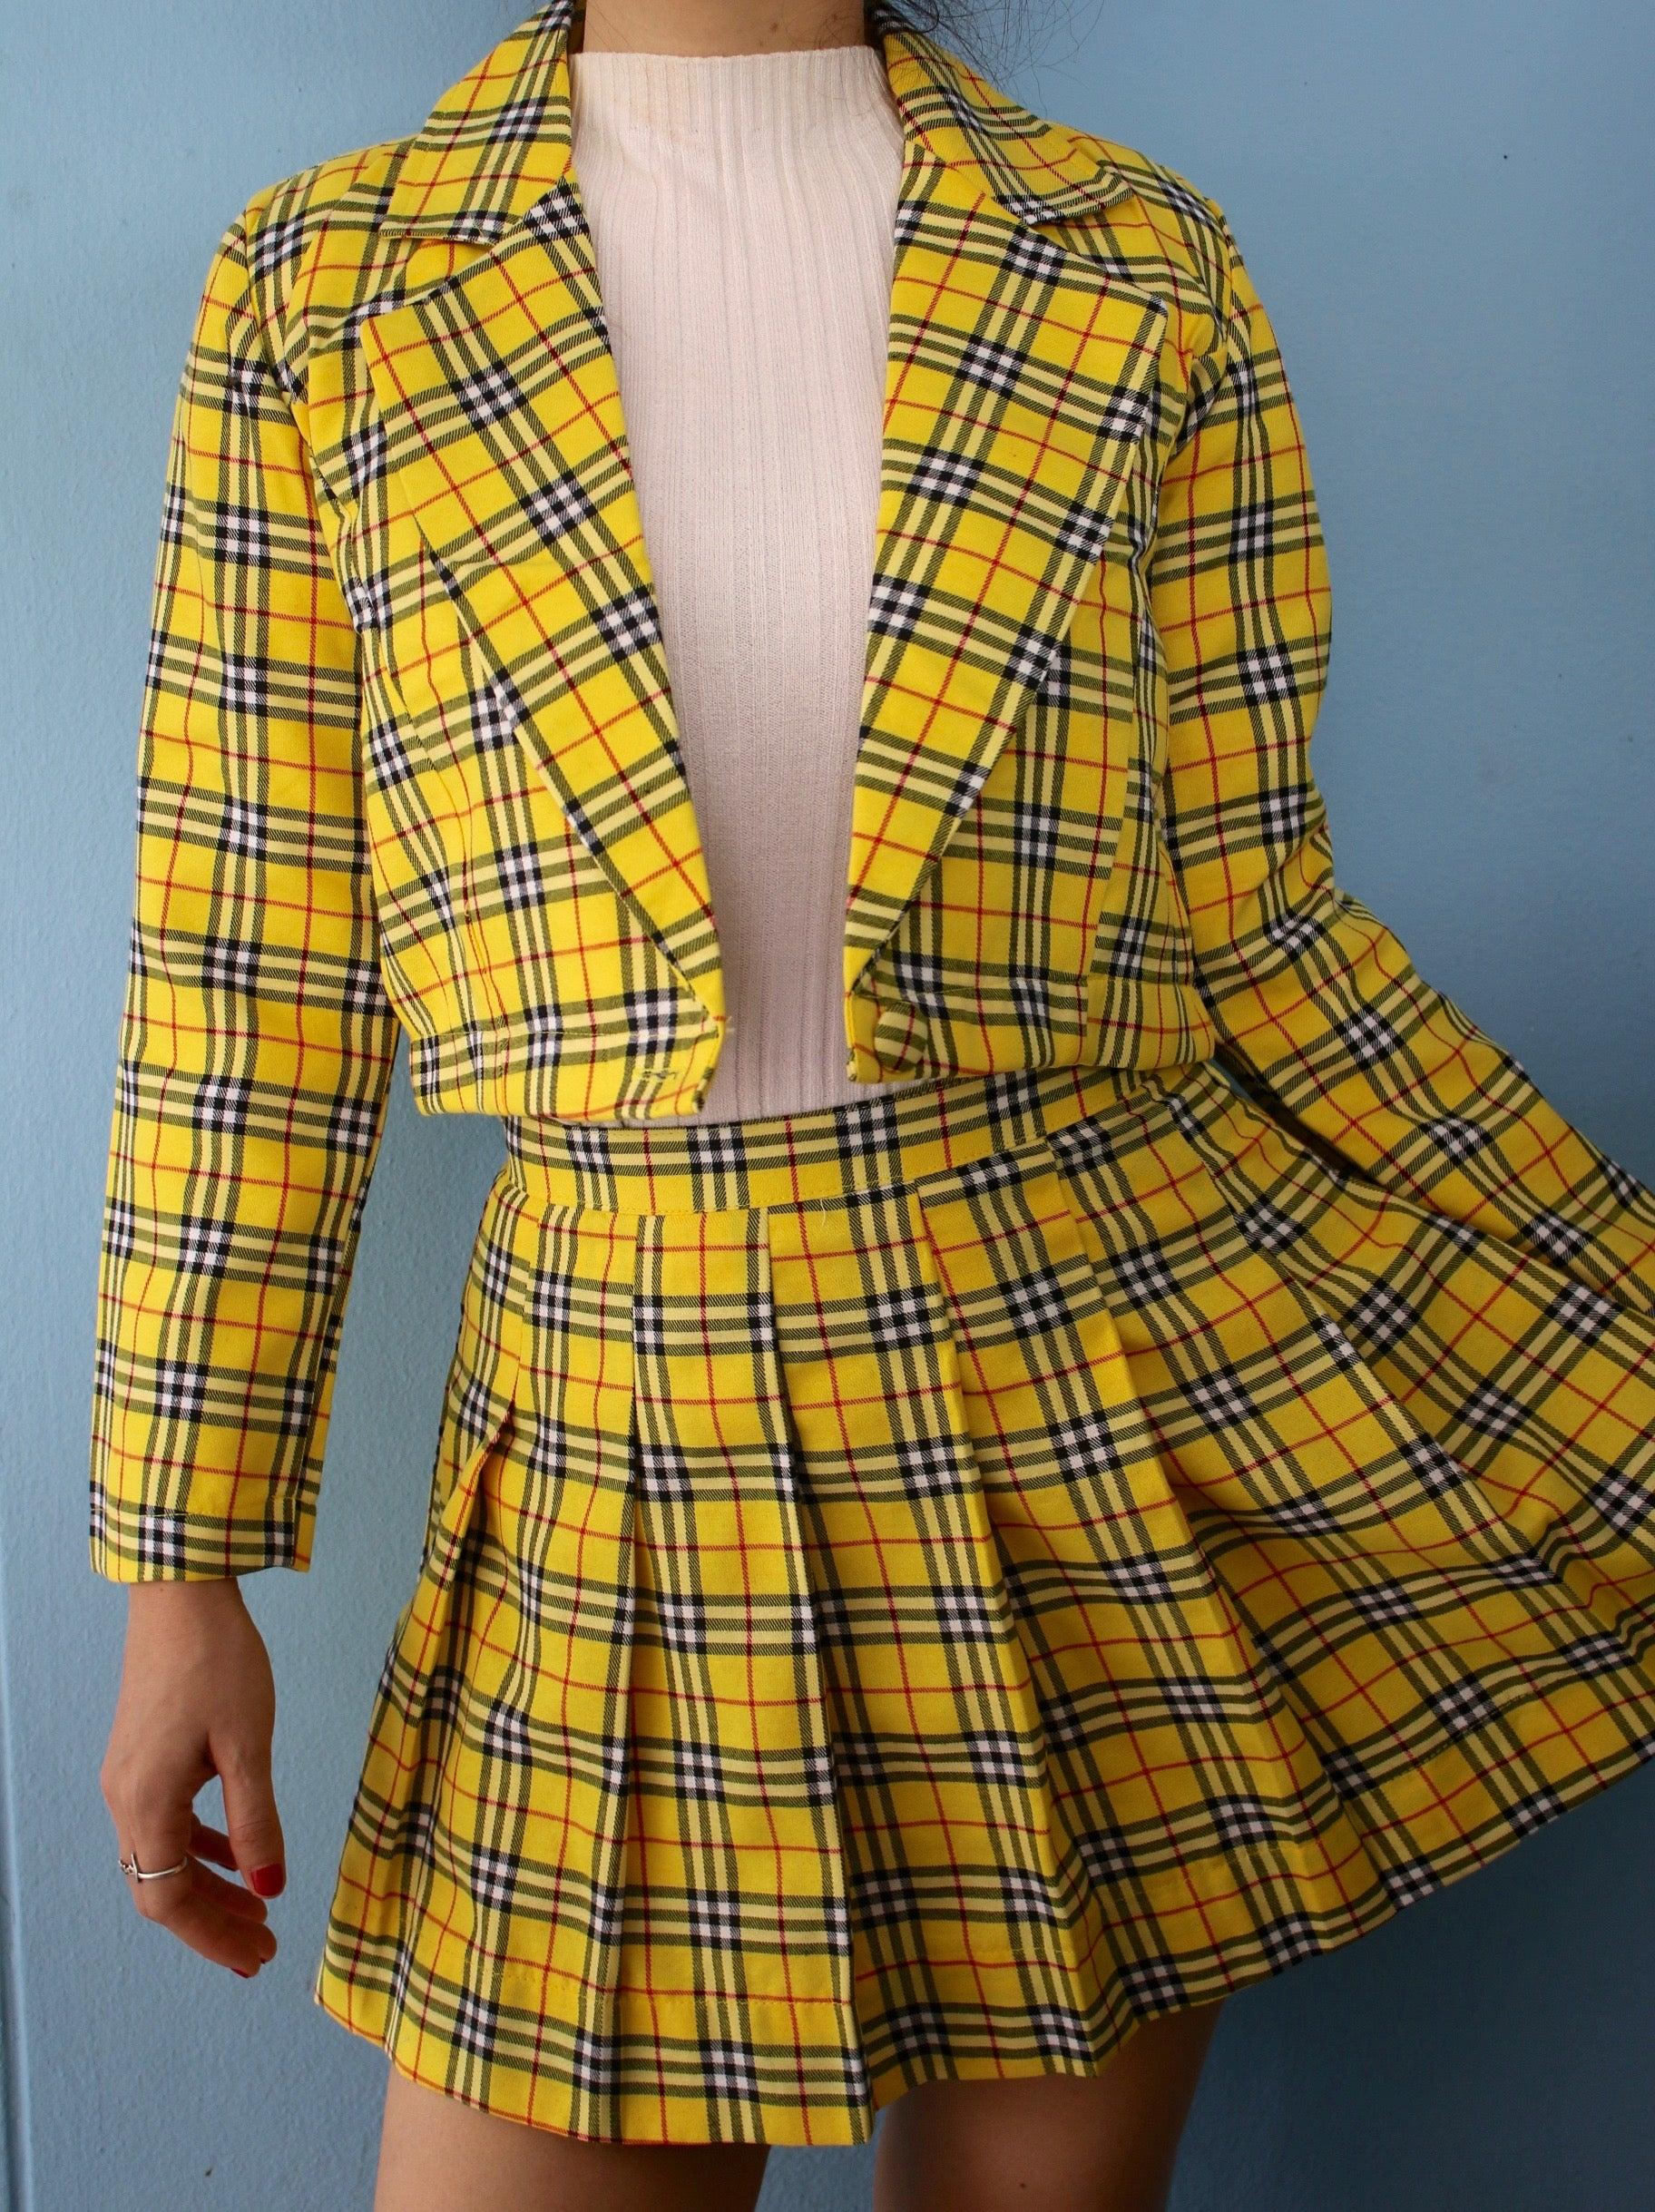 Clueless Inspired Tartan Outfits